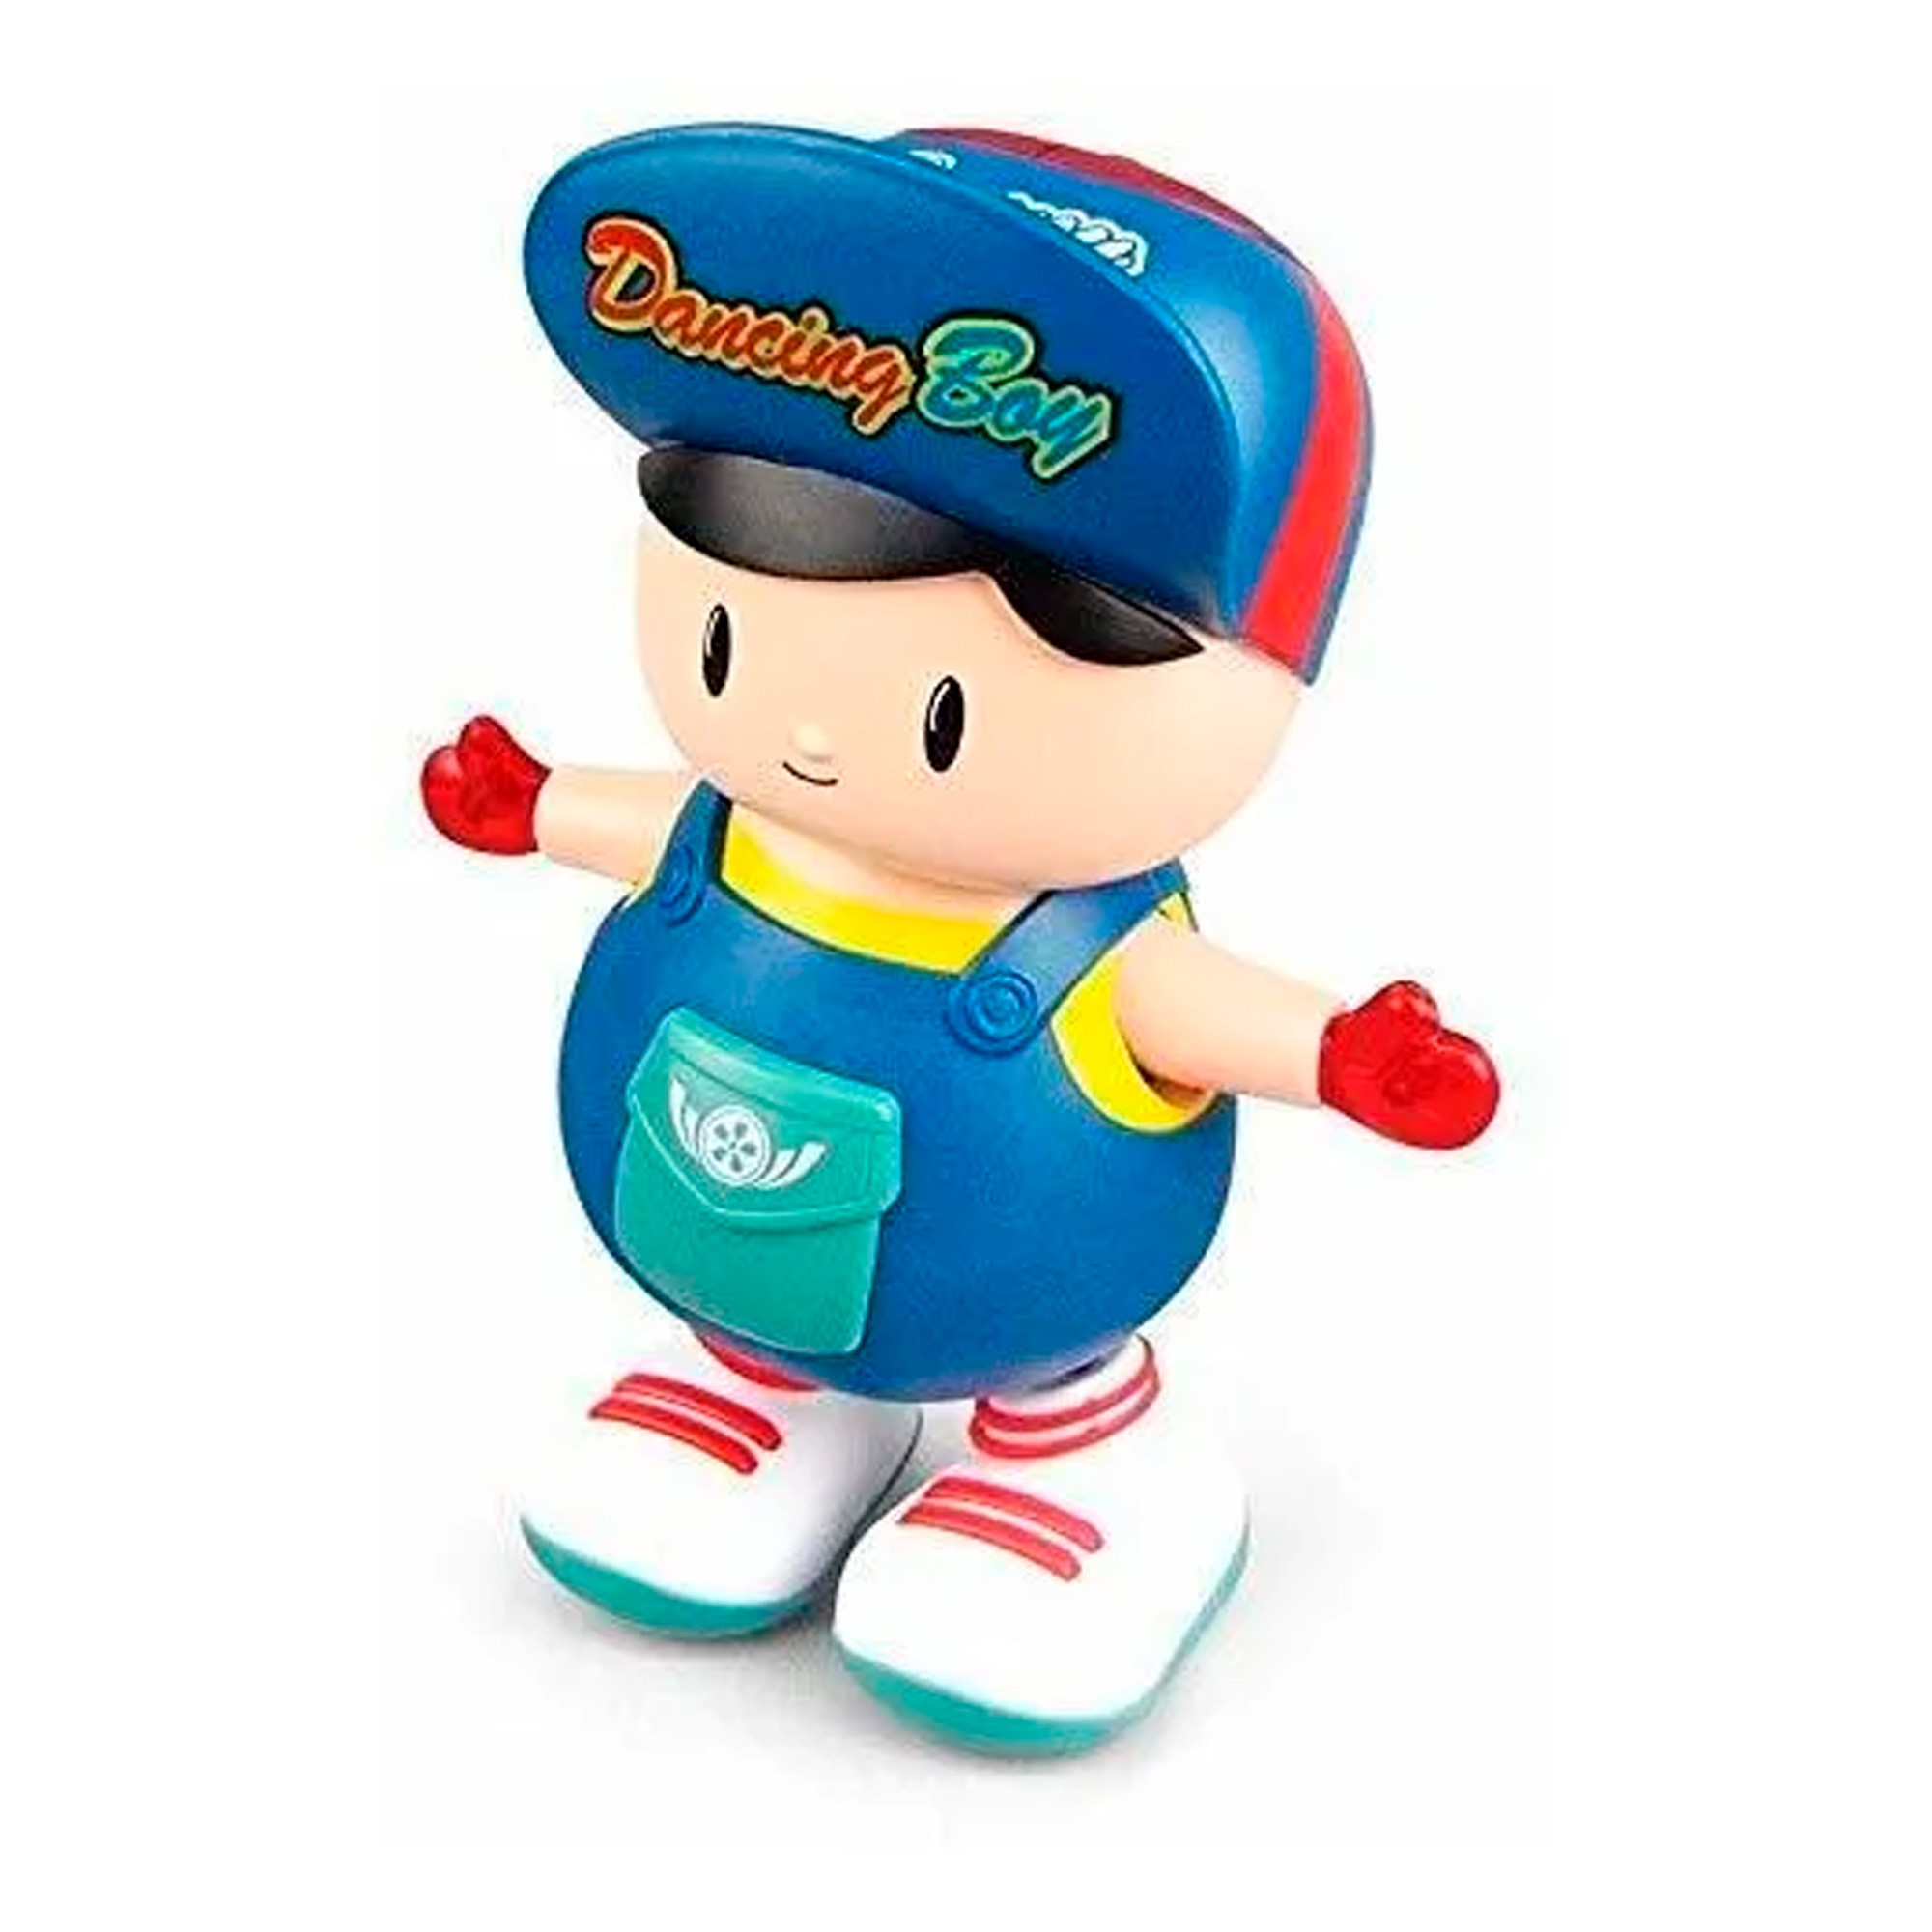 Dancing Boy Brinquedo Infantil Musical C/ Luz e Som